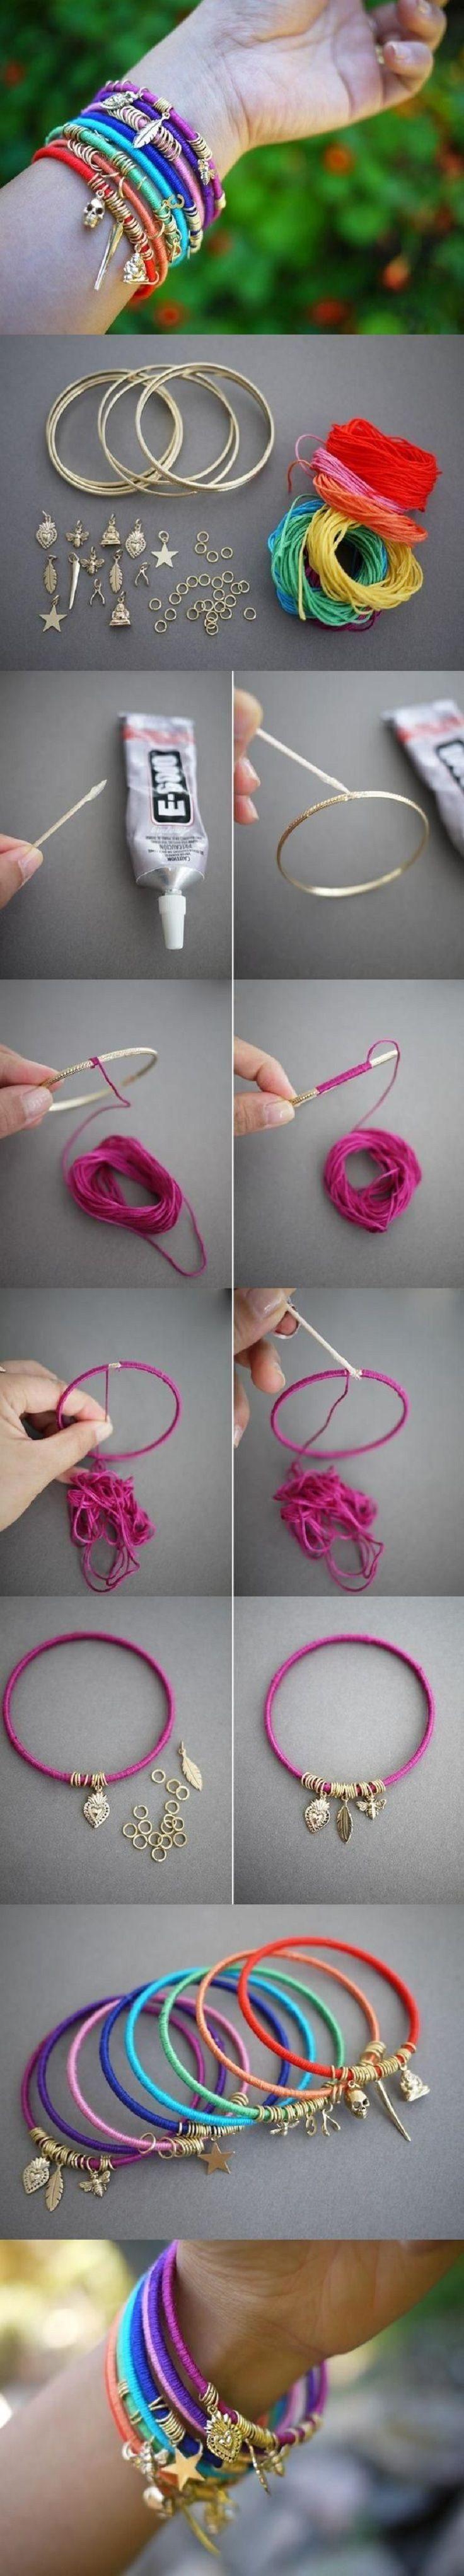 DIY Easy To Make Bracelets.